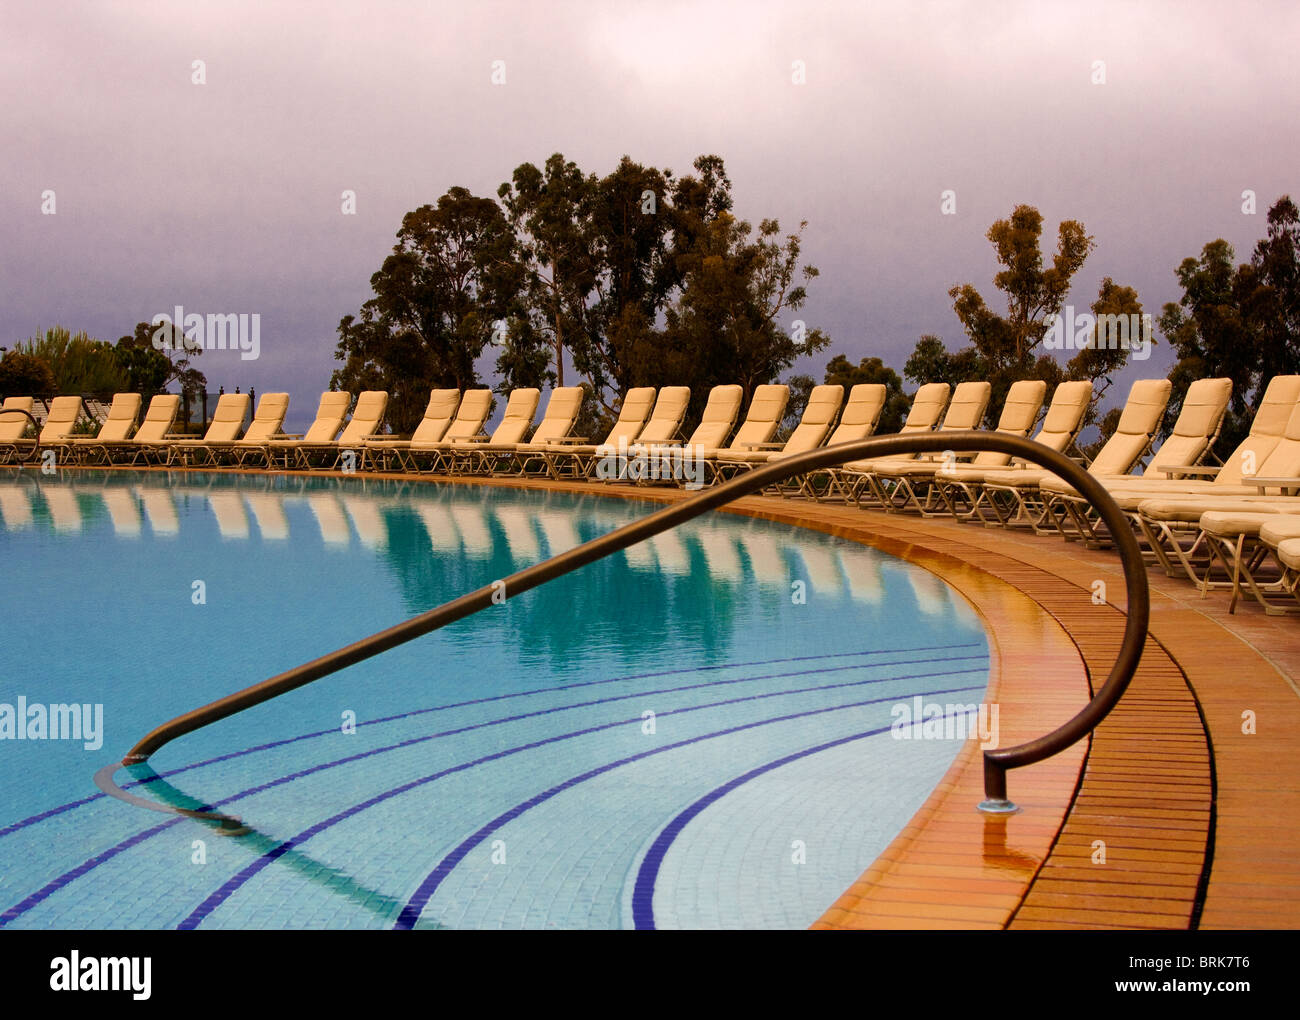 Graphic image of swimming pool at Pelican Hill Resort,  Newport Beach, California - Stock Image